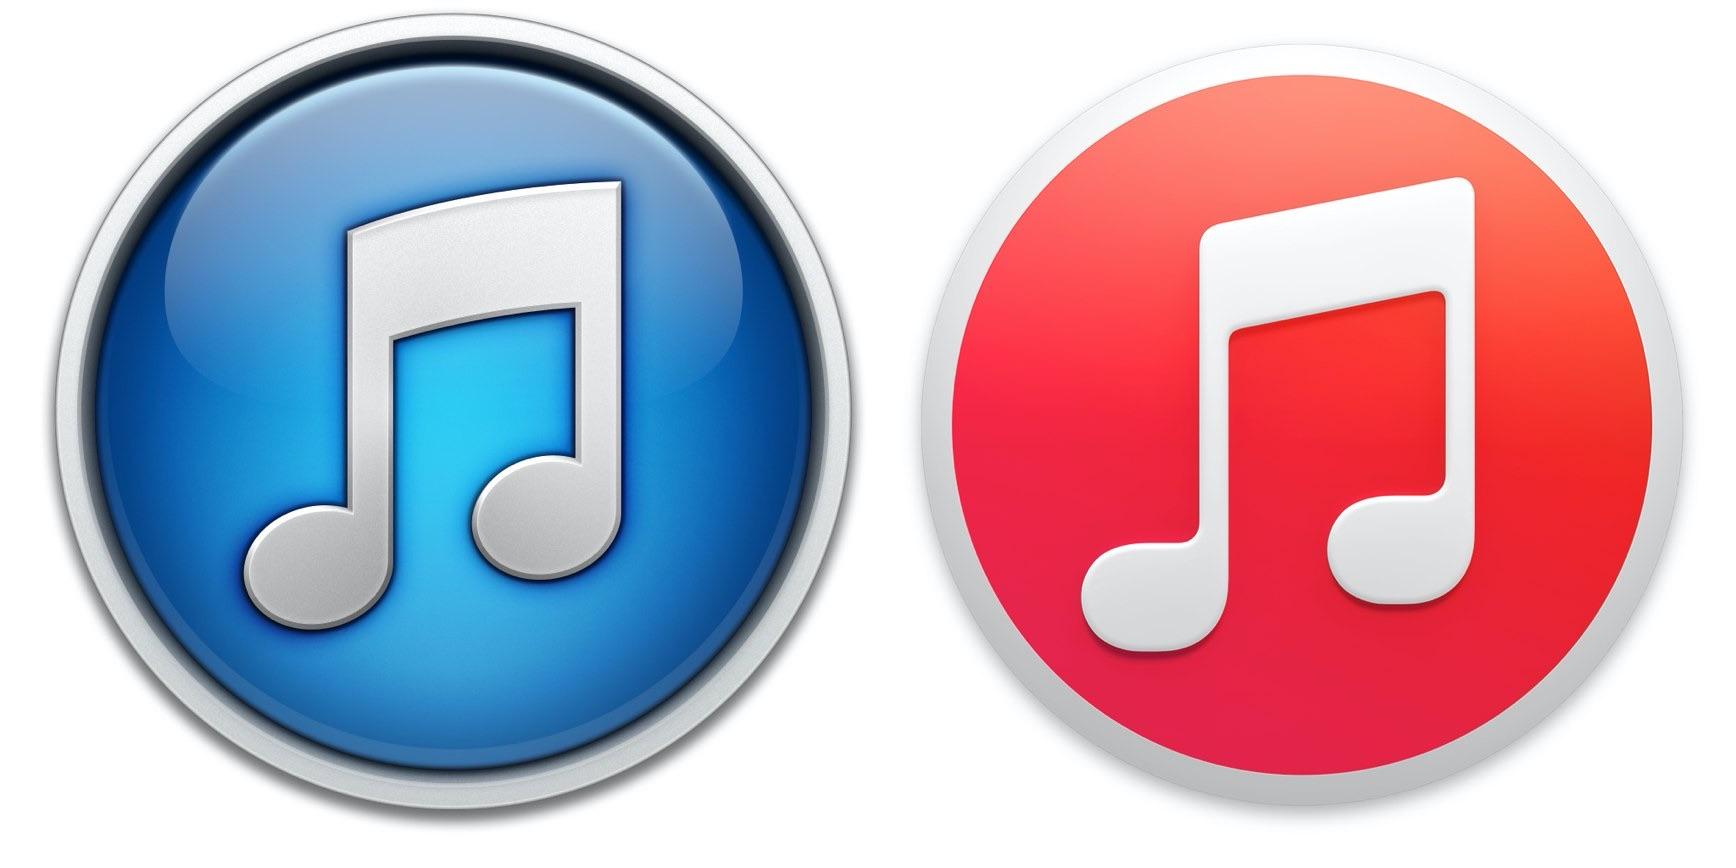 iTunes v11とv12のアイコン